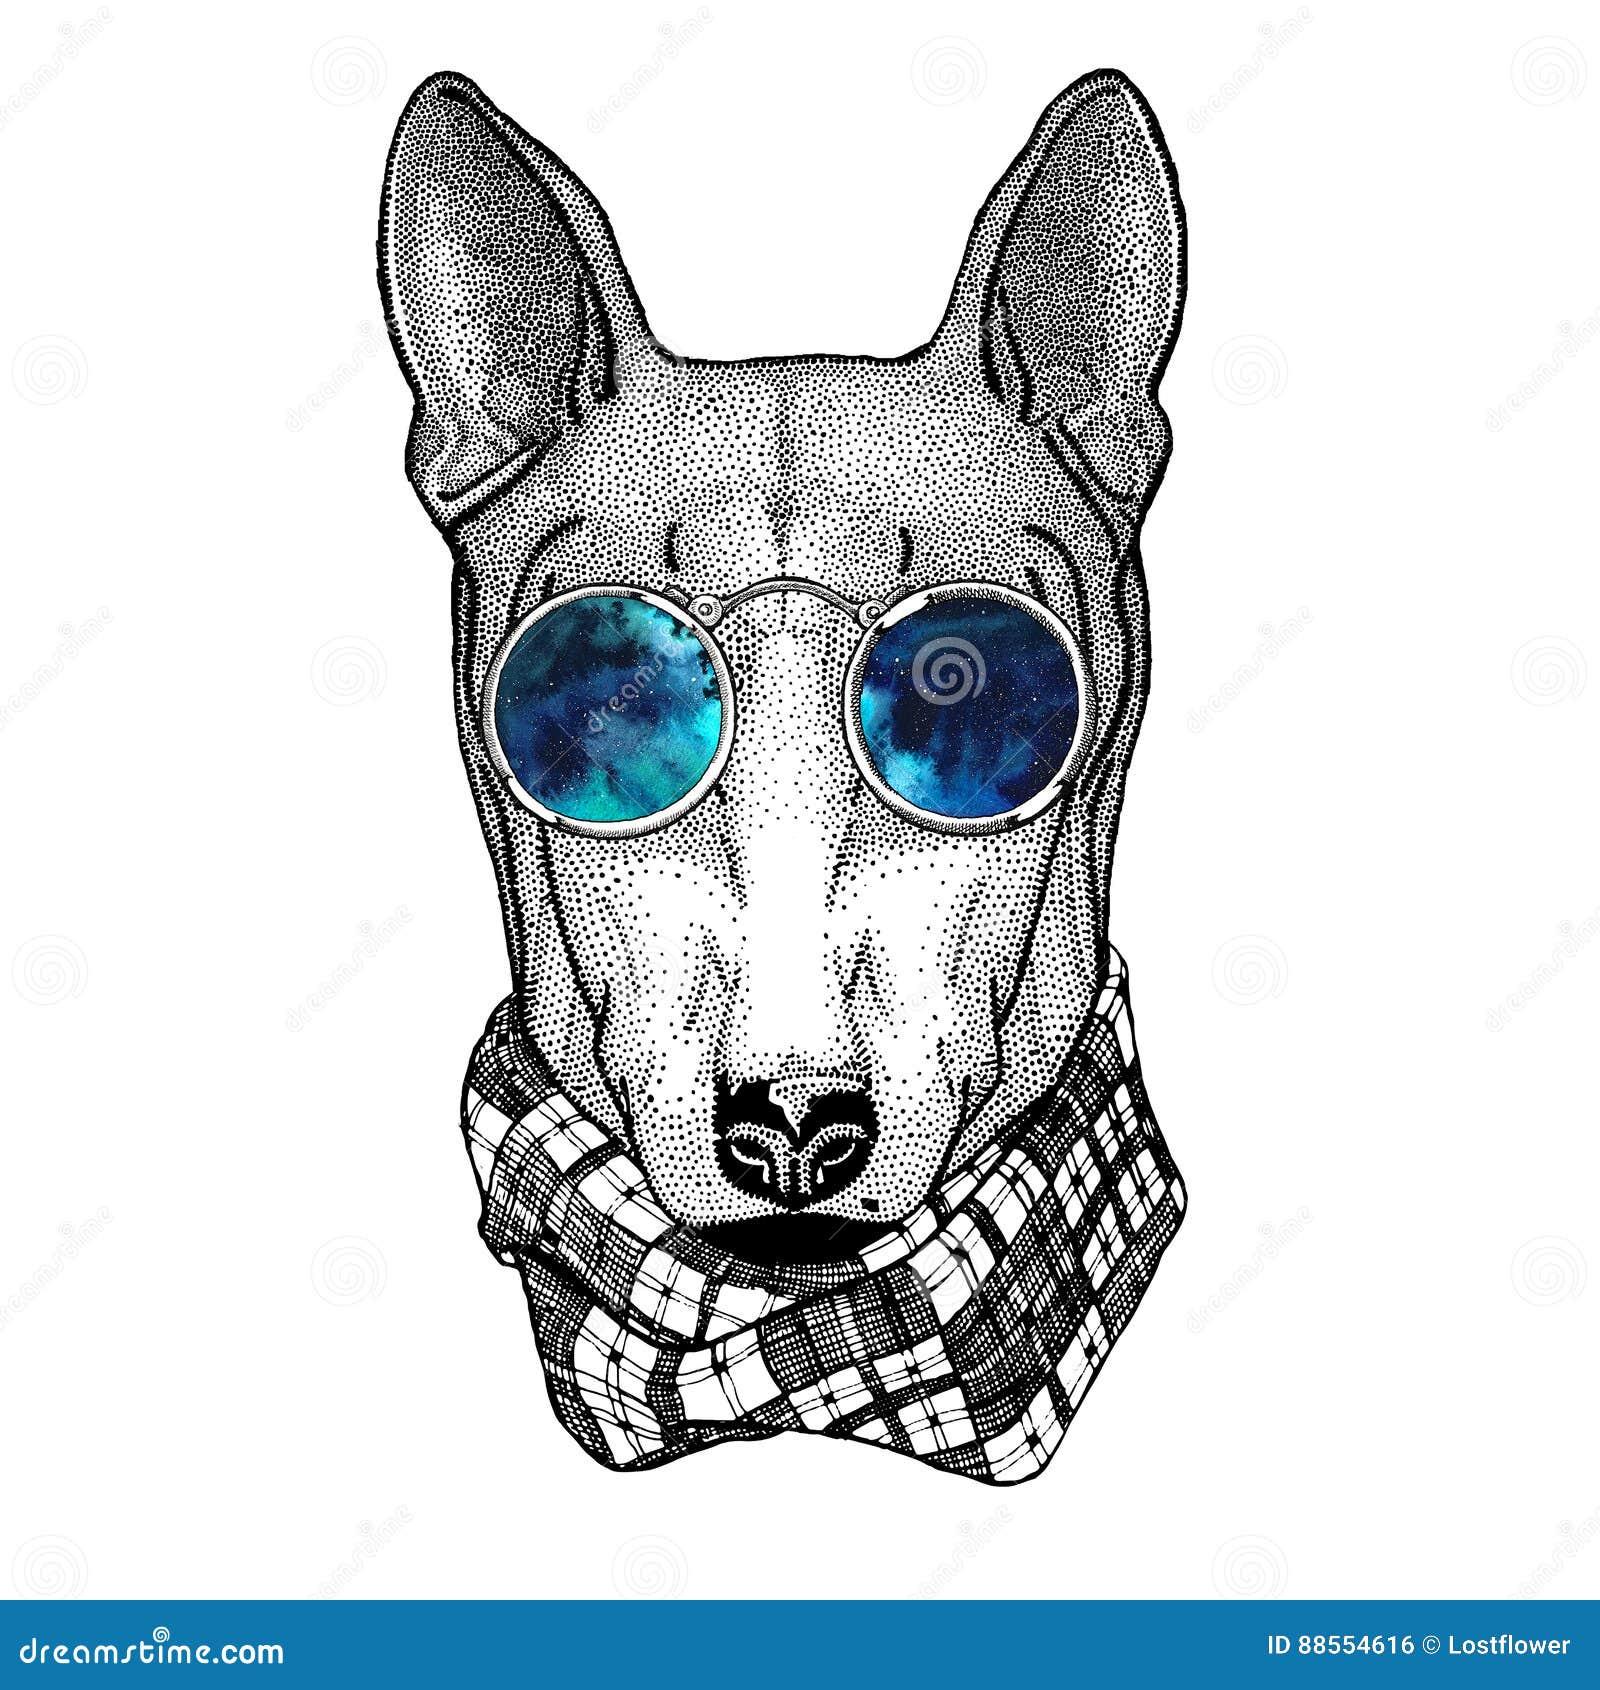 Dog tattoo vector illustration 8367332 for Tattoo style logo design